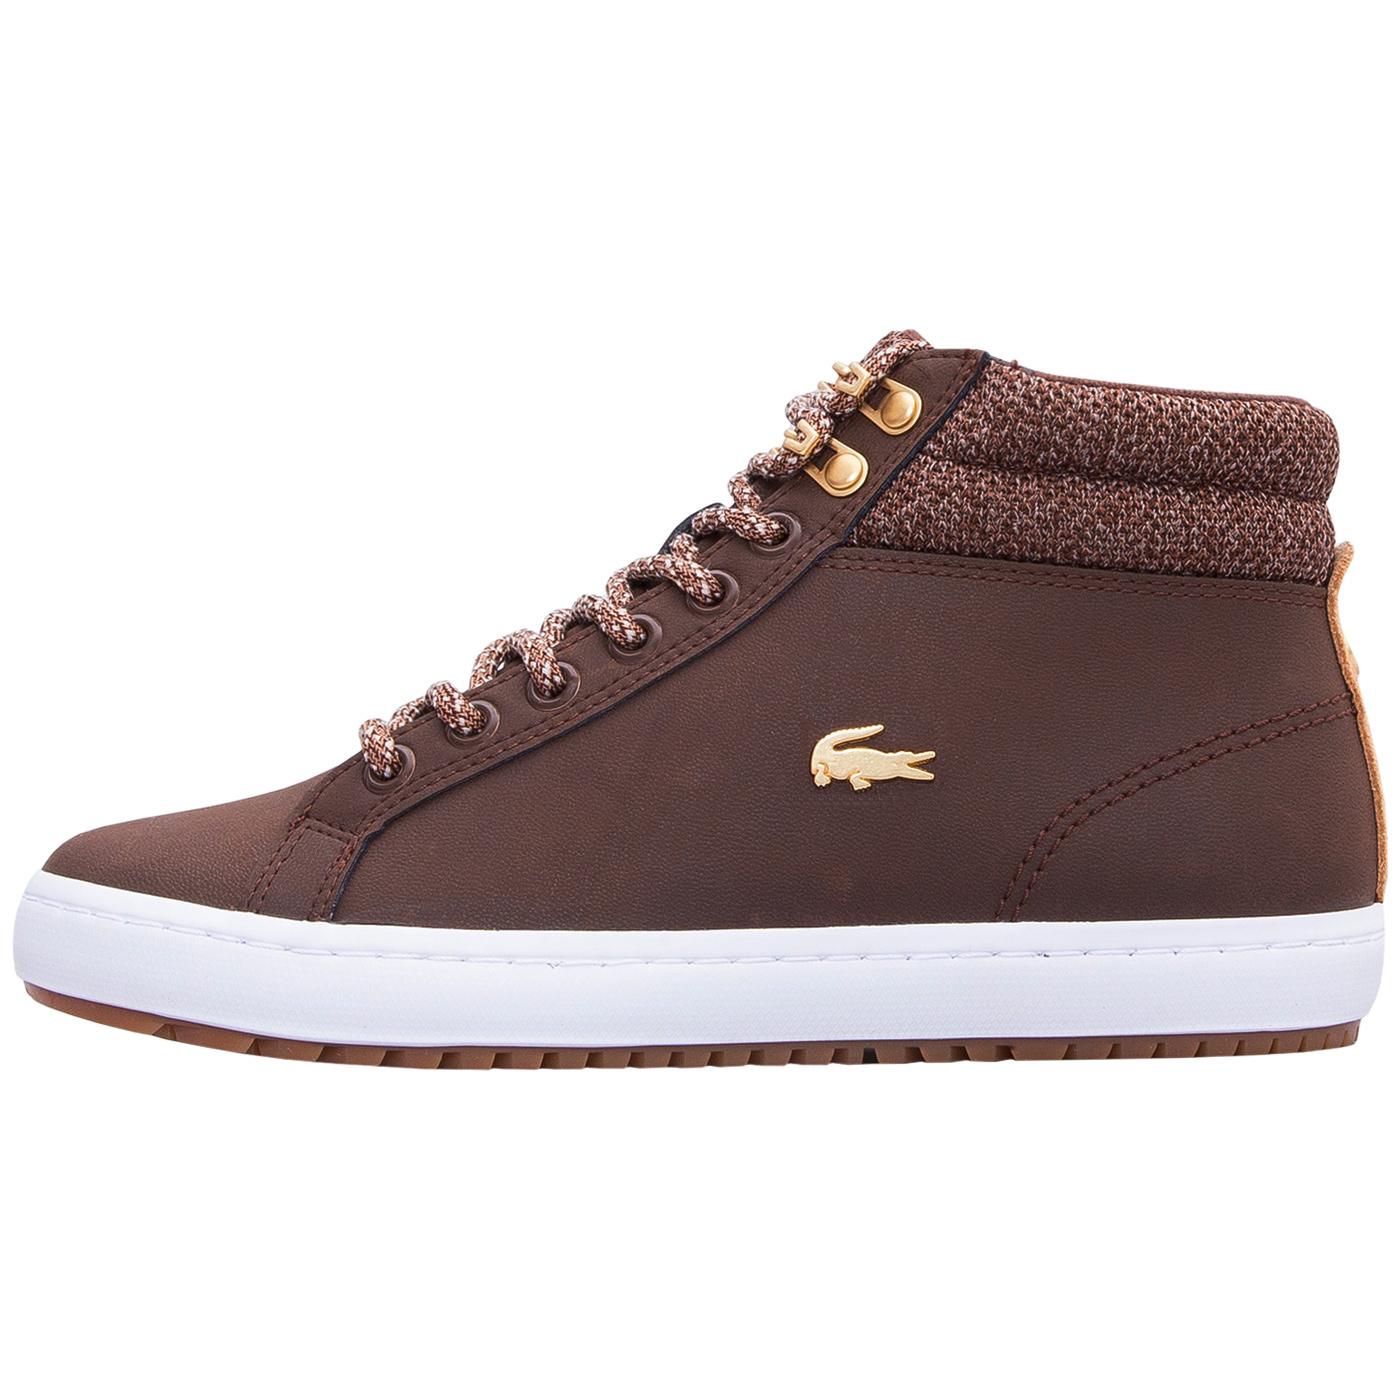 Lacoste 36caw0045b18 Sneaker Damen Dunkelbraun Insulate 7 Straightset PPxSqv4wnU